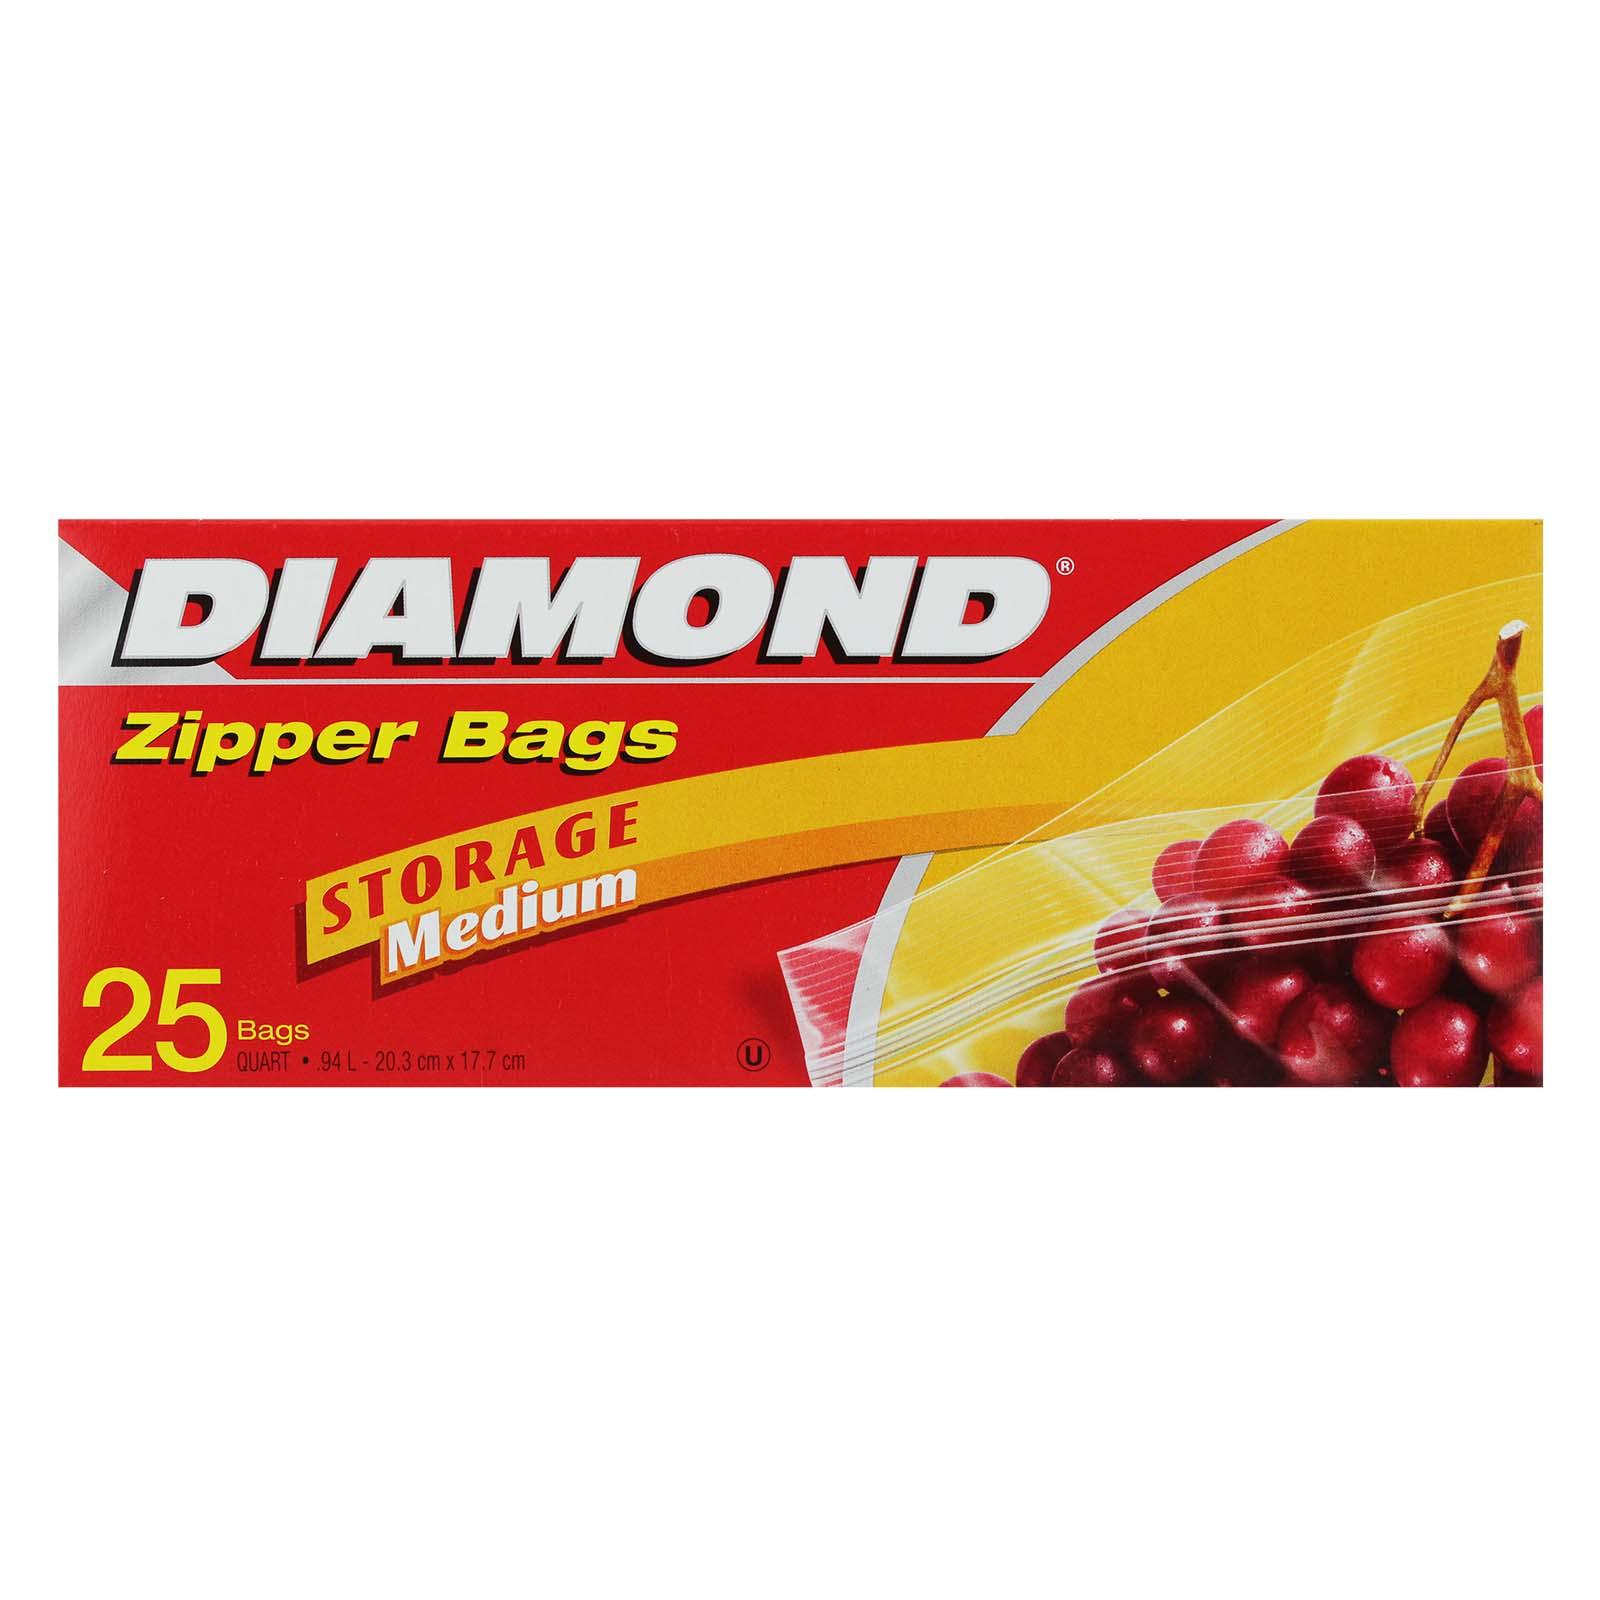 Diamond Zipper Bags Medium Storage 25s